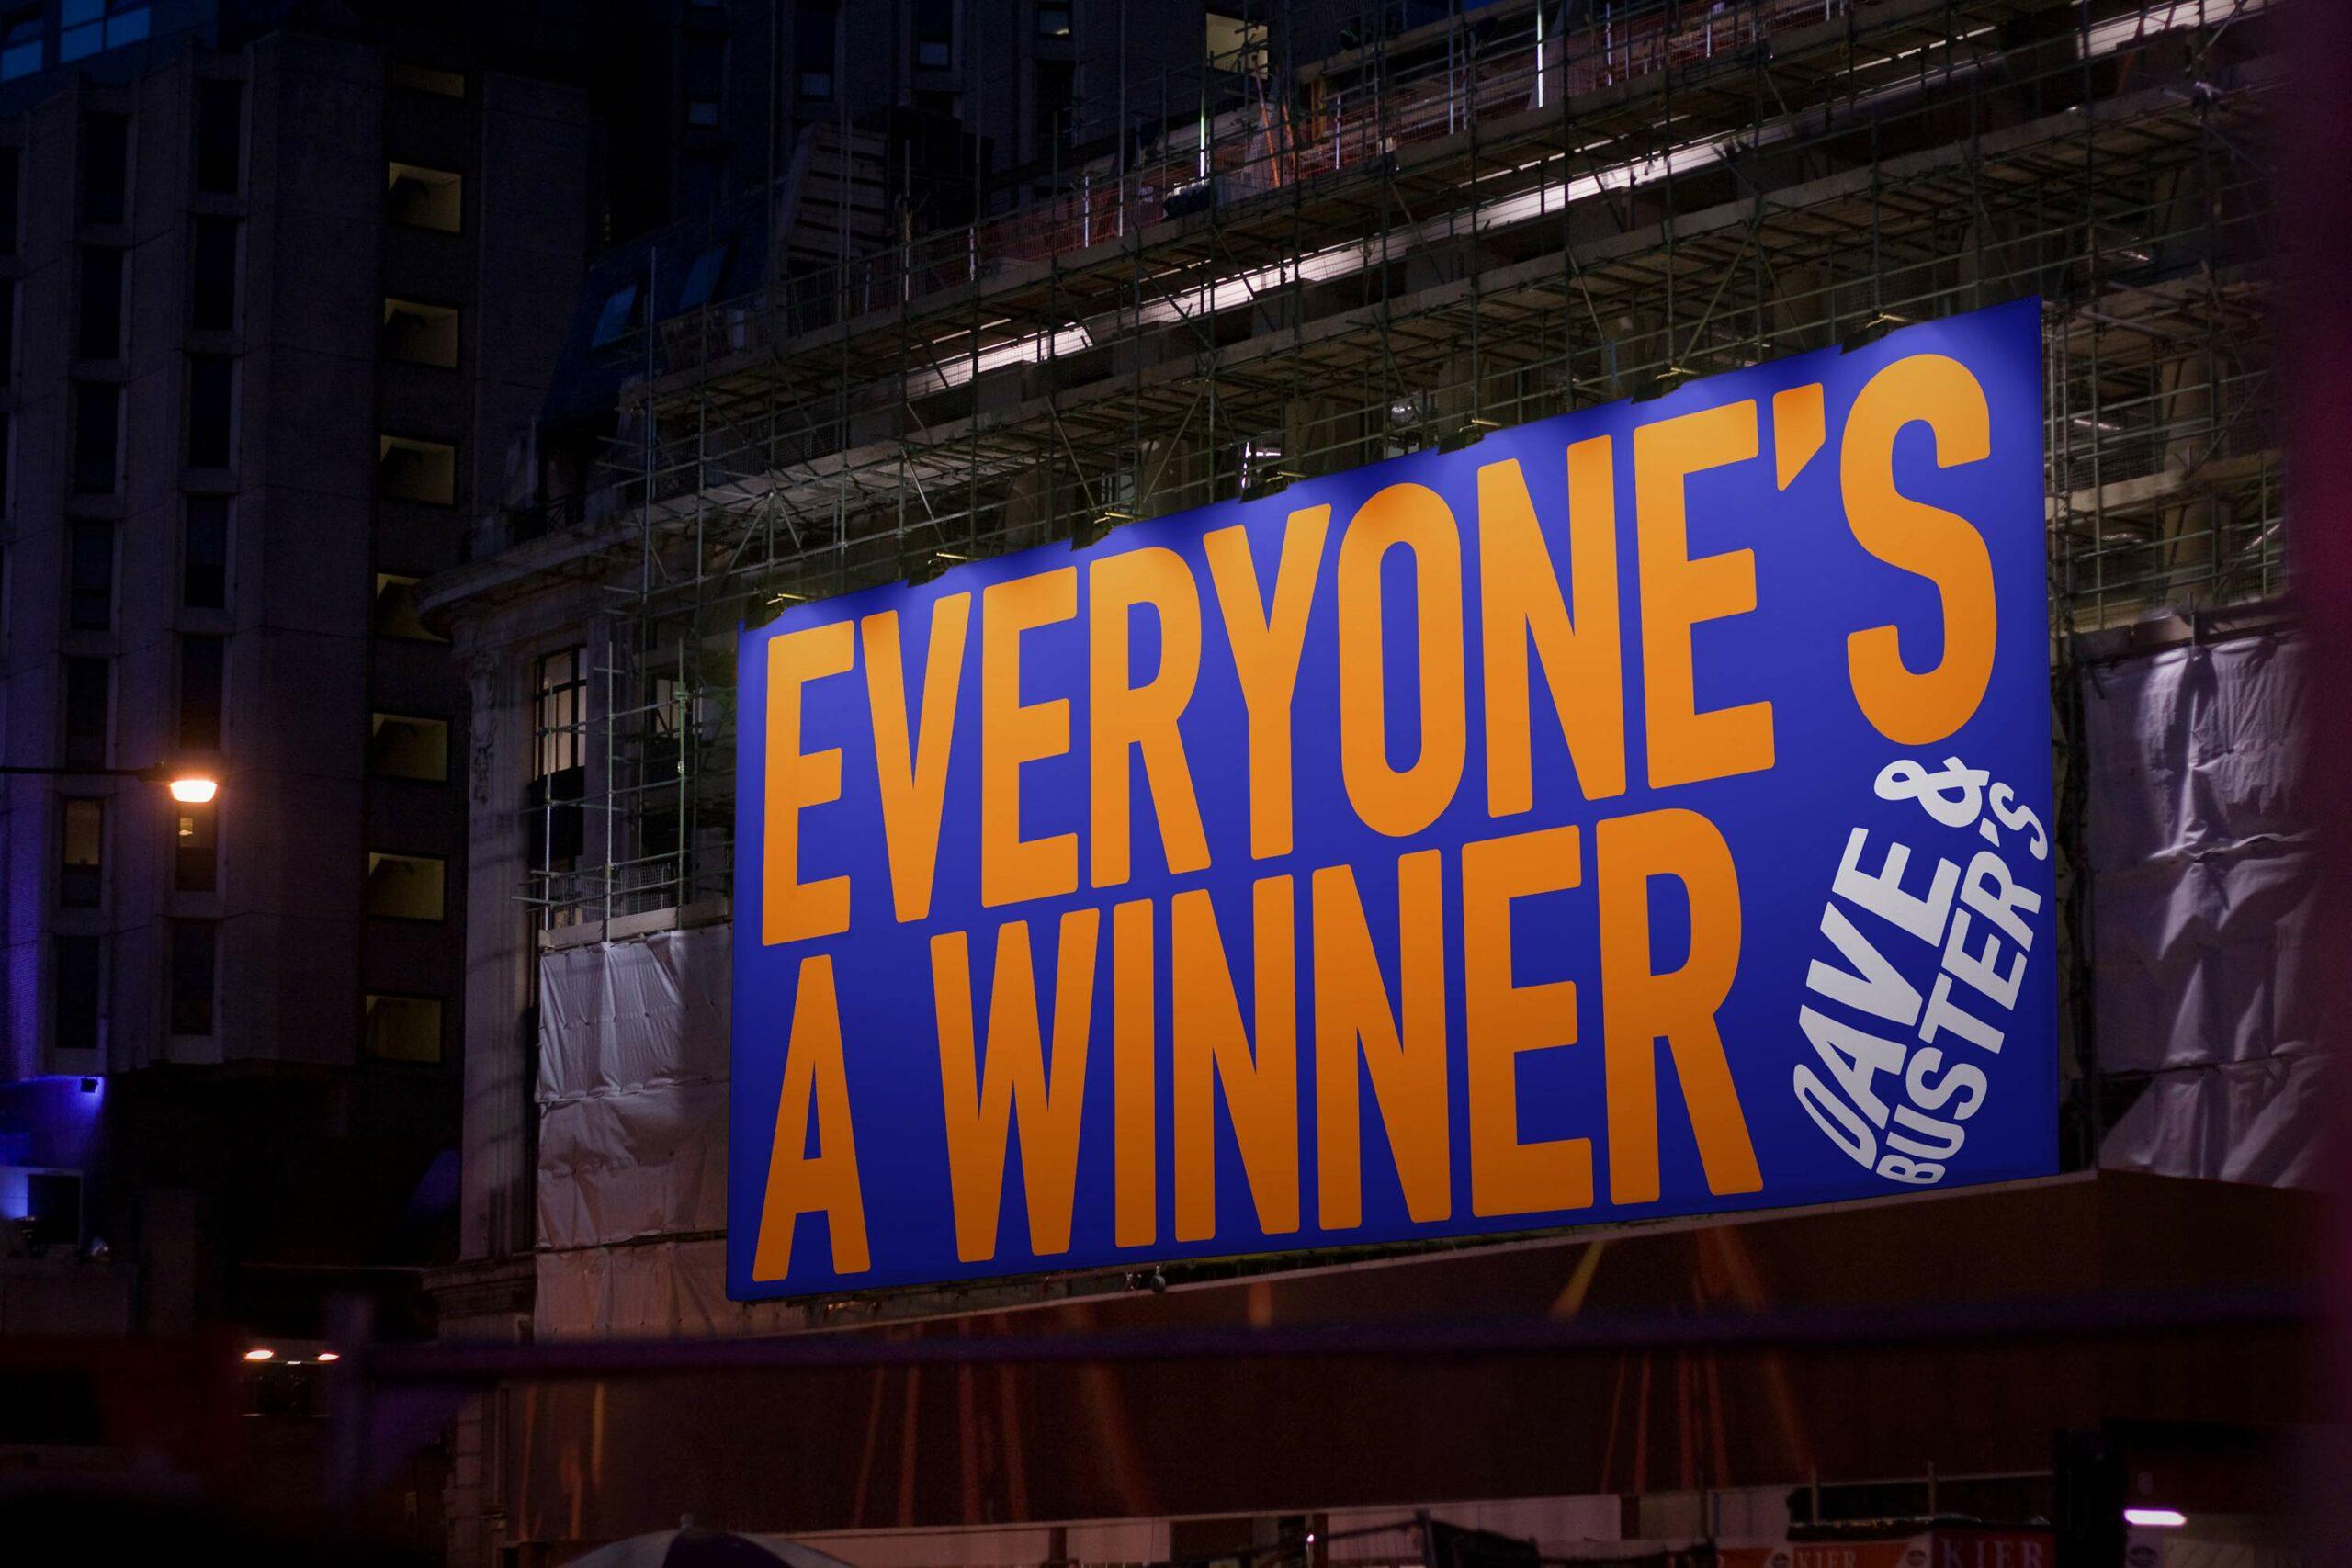 Matt van Leeuwen, Dave & Buster's, Mother Design, Logo, Identity, Matthijs van Leeuwen, Everyone's A Winner